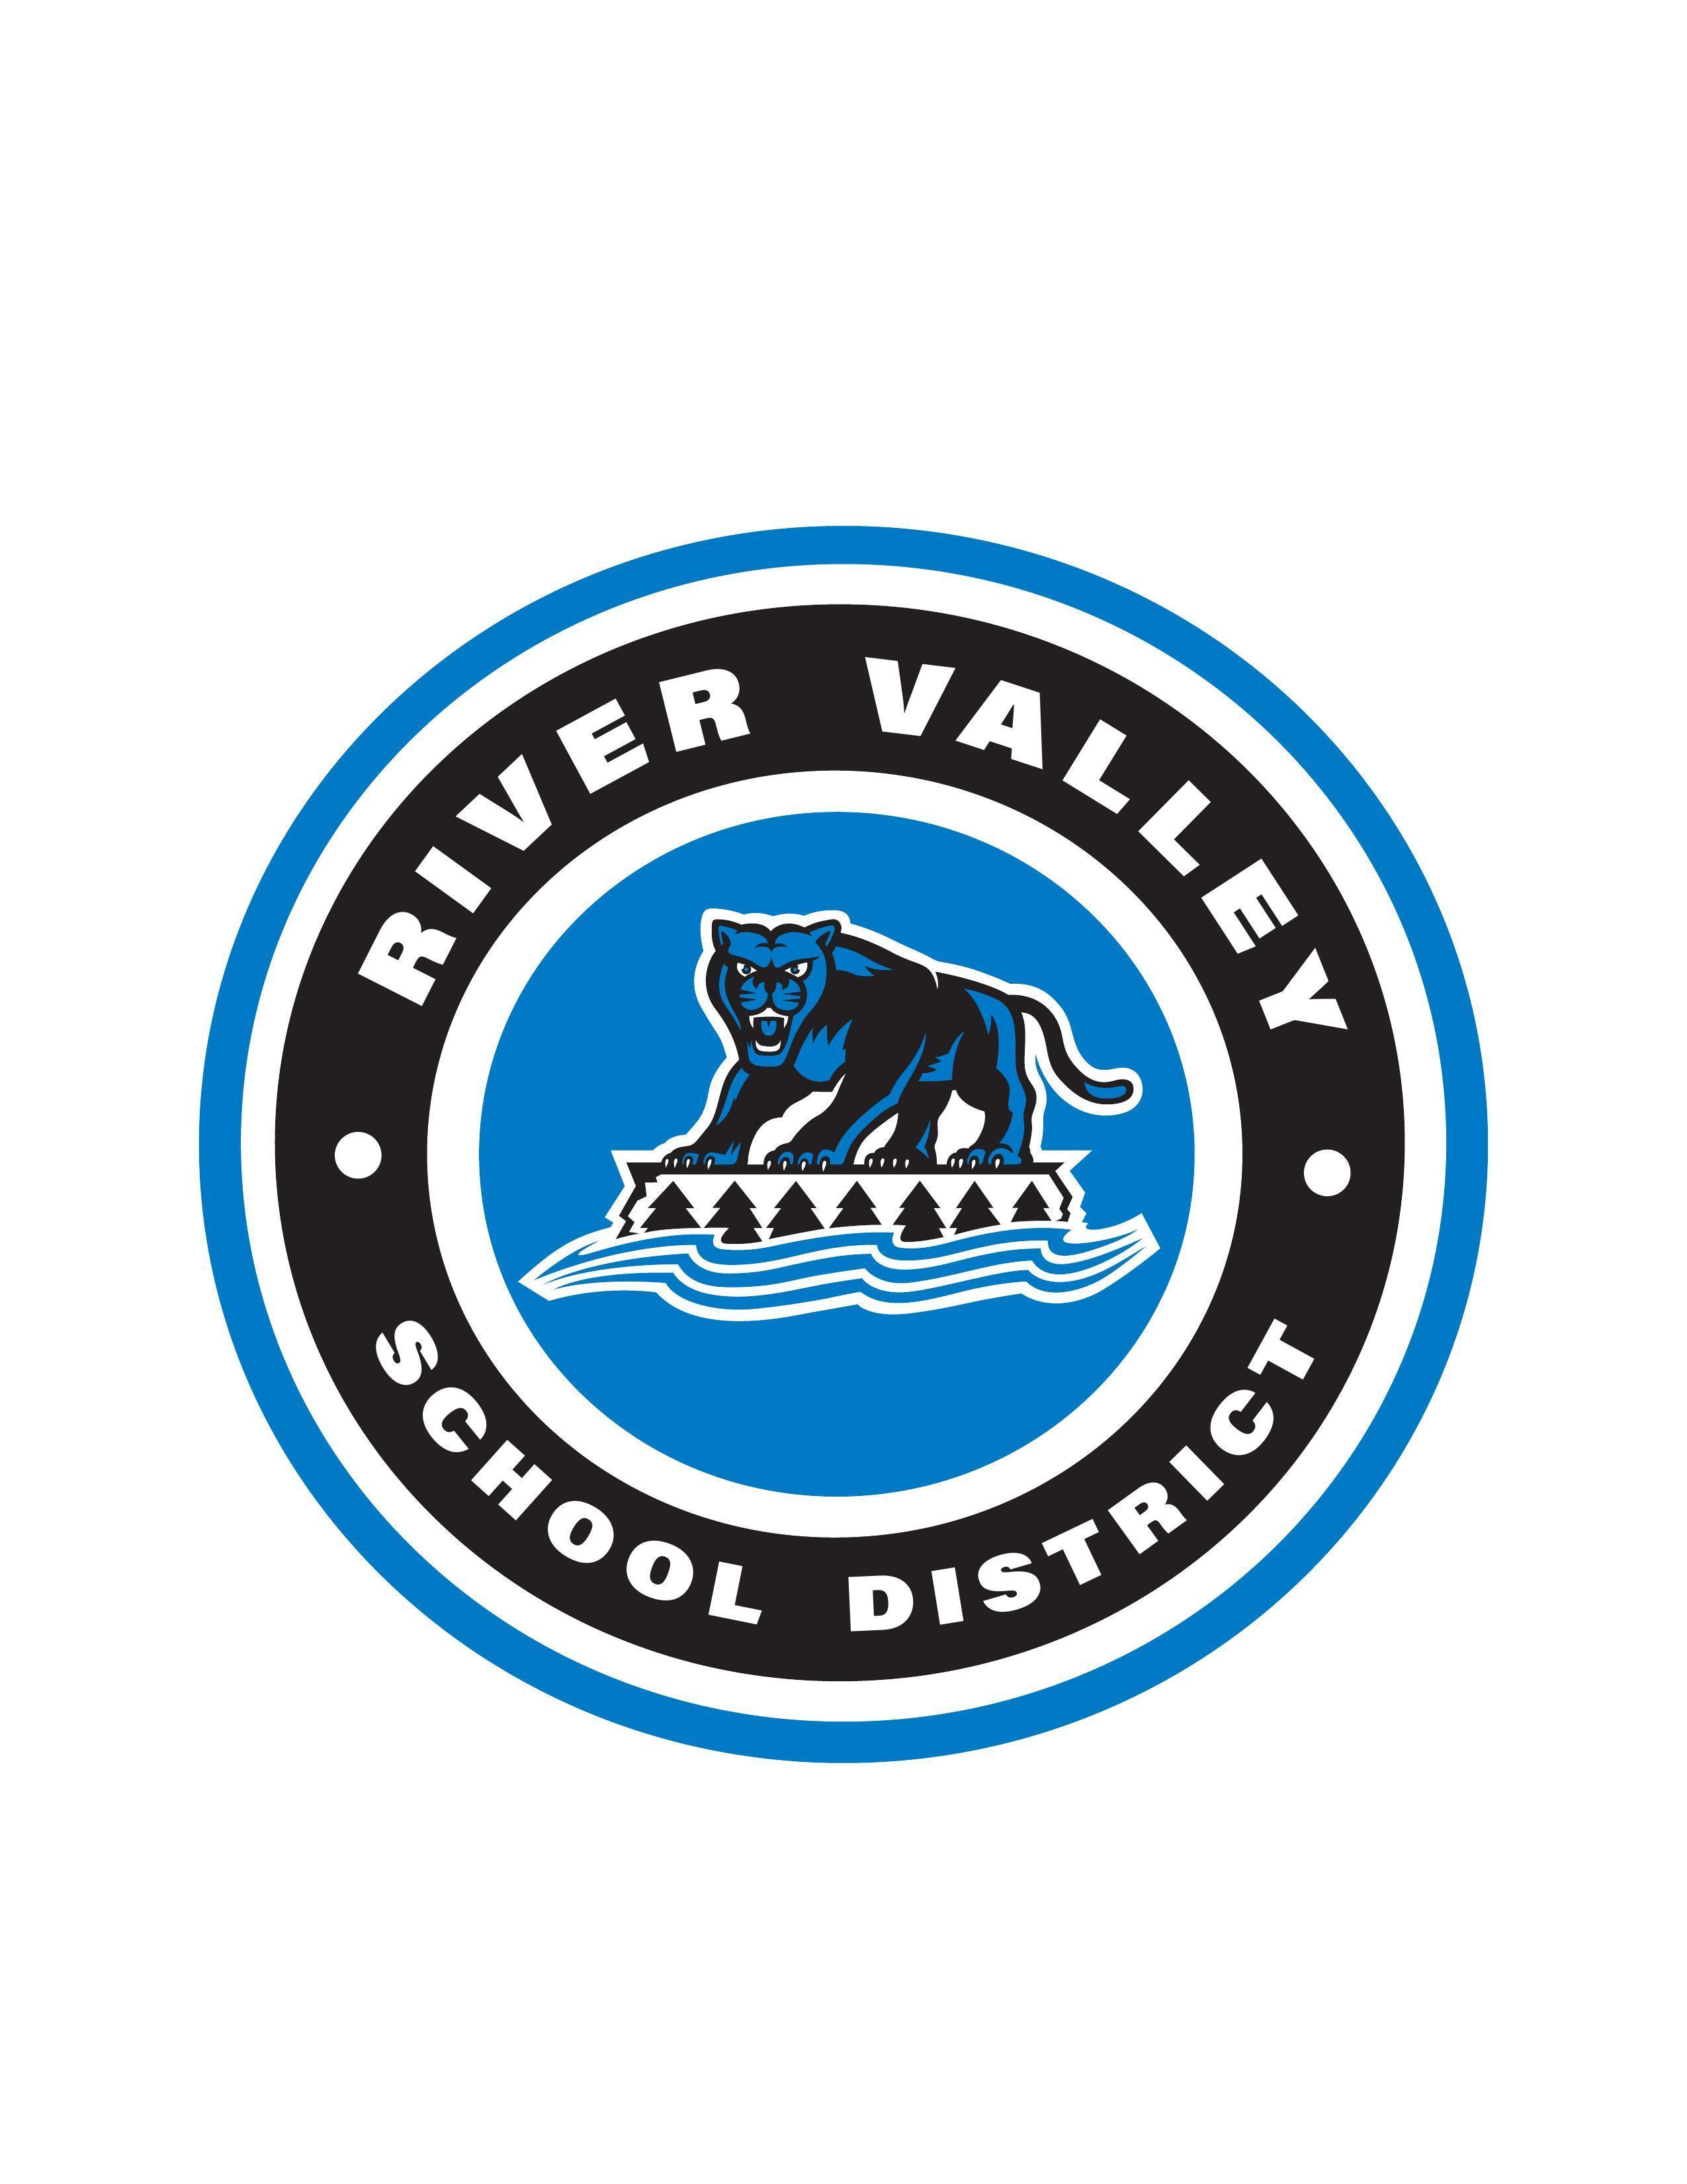 River Valley School District